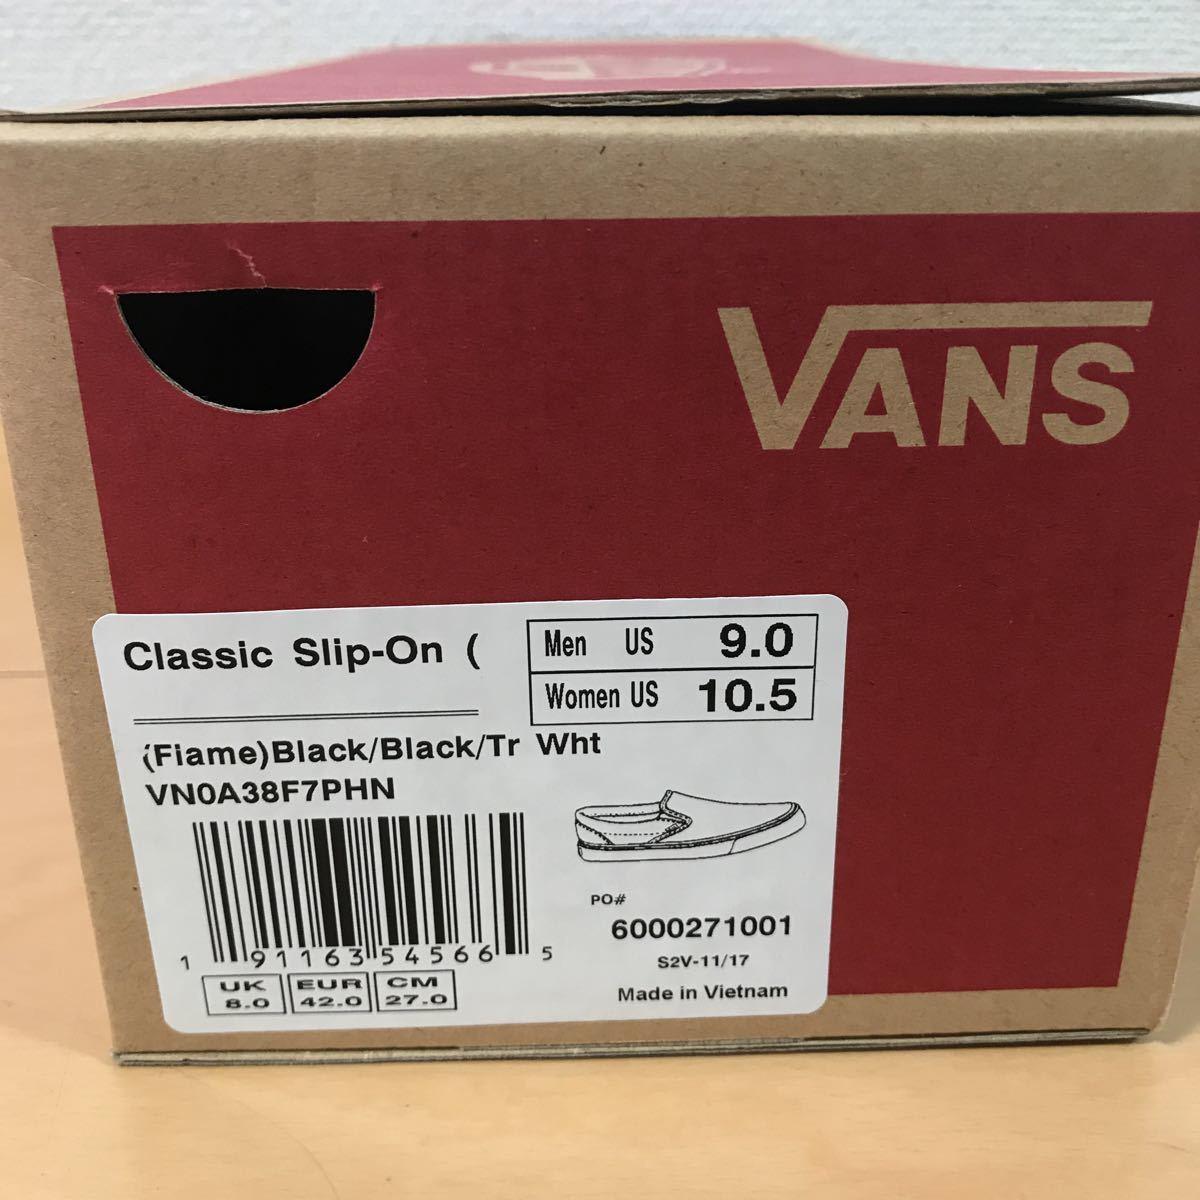 27.0cm 新品 US企画 VANS CLASSIC SLIP ON FLAME バンズ スリッポン フレーム スリップオン 黒 ブラック BLACK_画像7